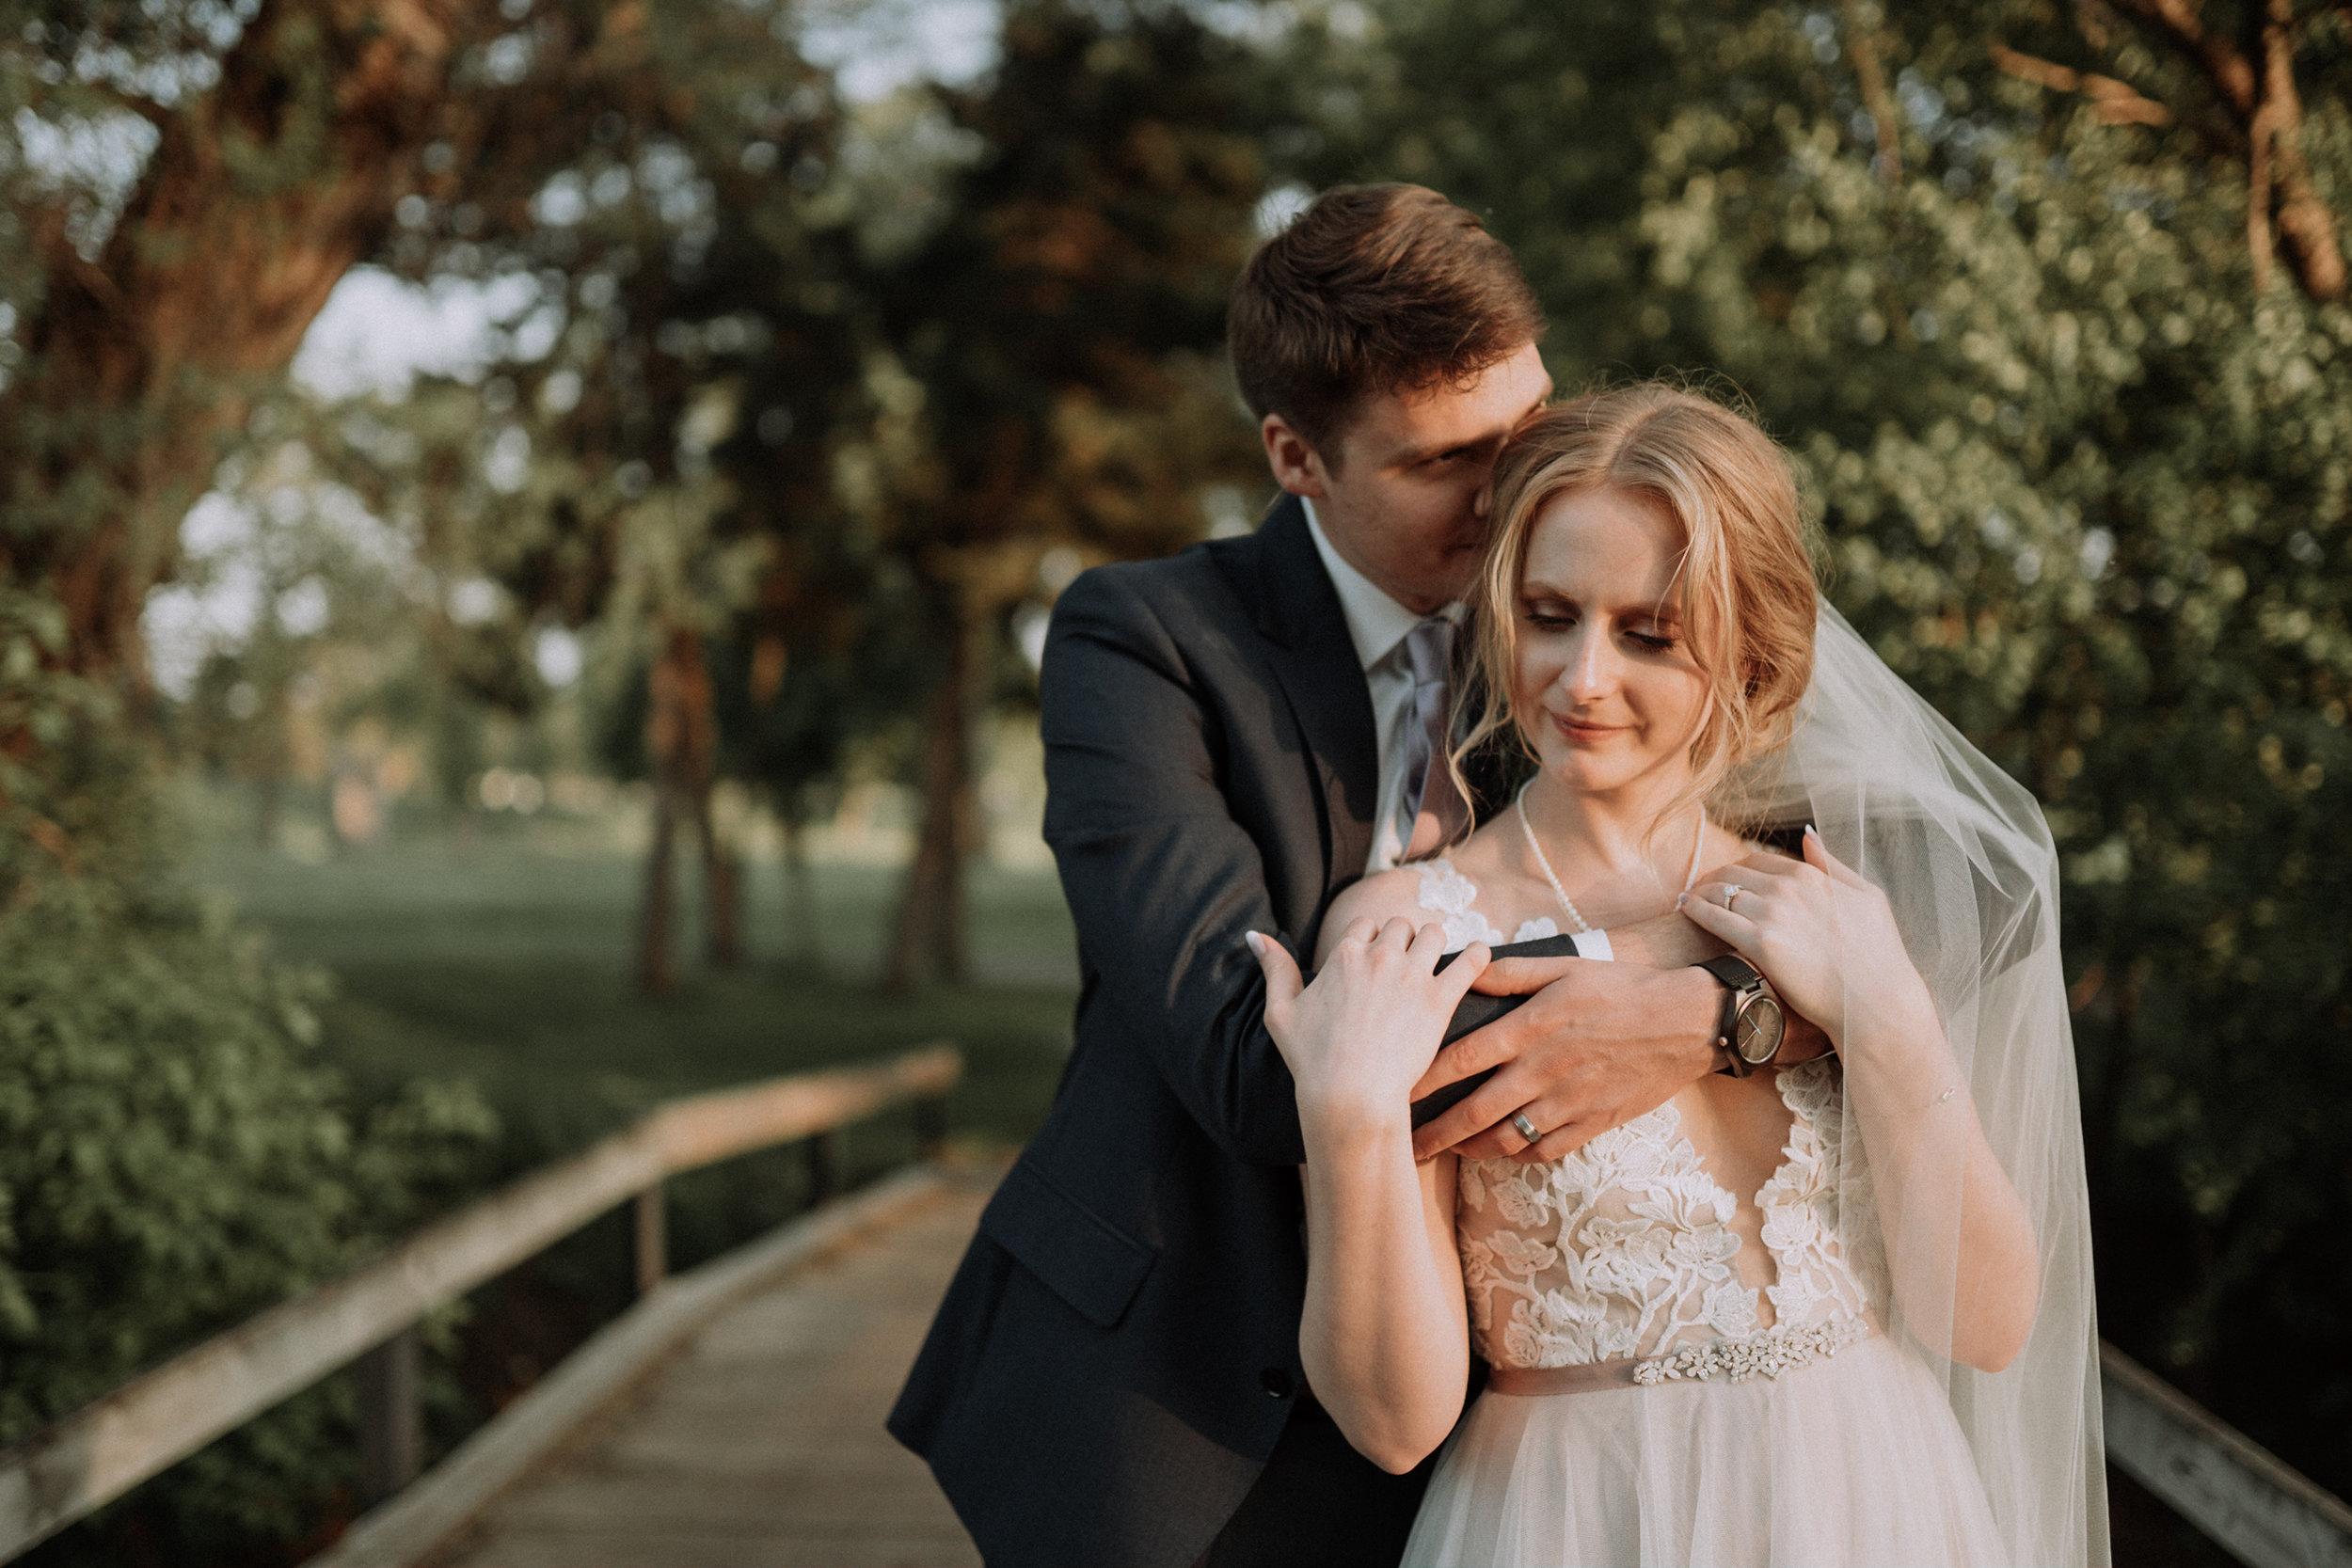 Wedding_(7_of_10).jpg